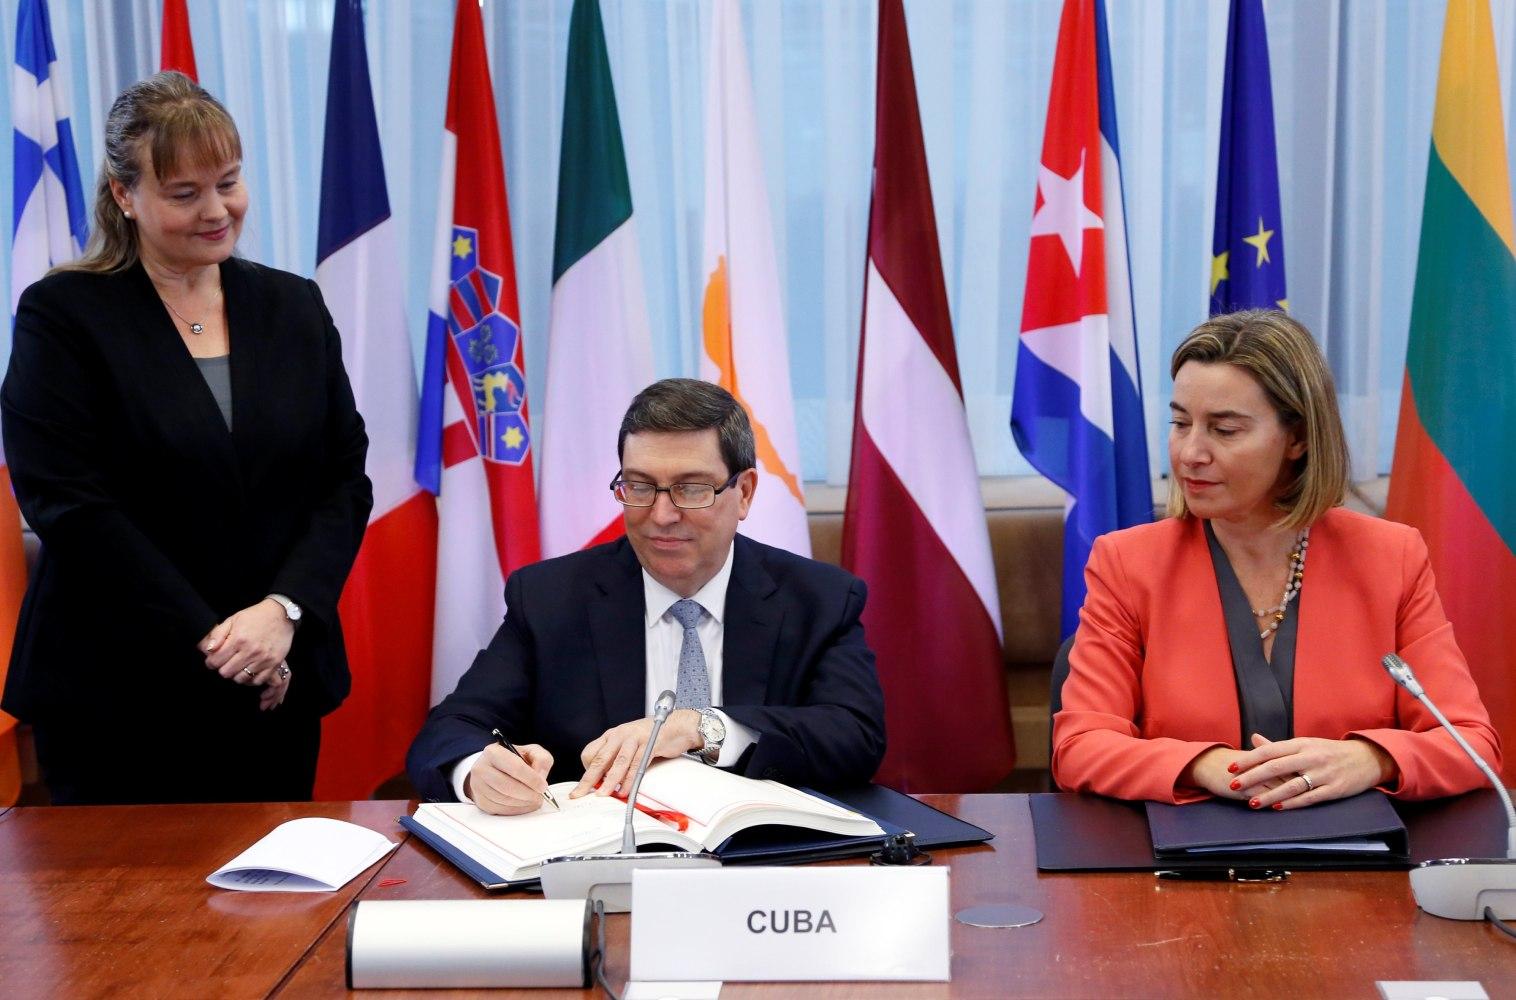 EU, Cuba sign cooperation pact, vow Trump will not hurt ties